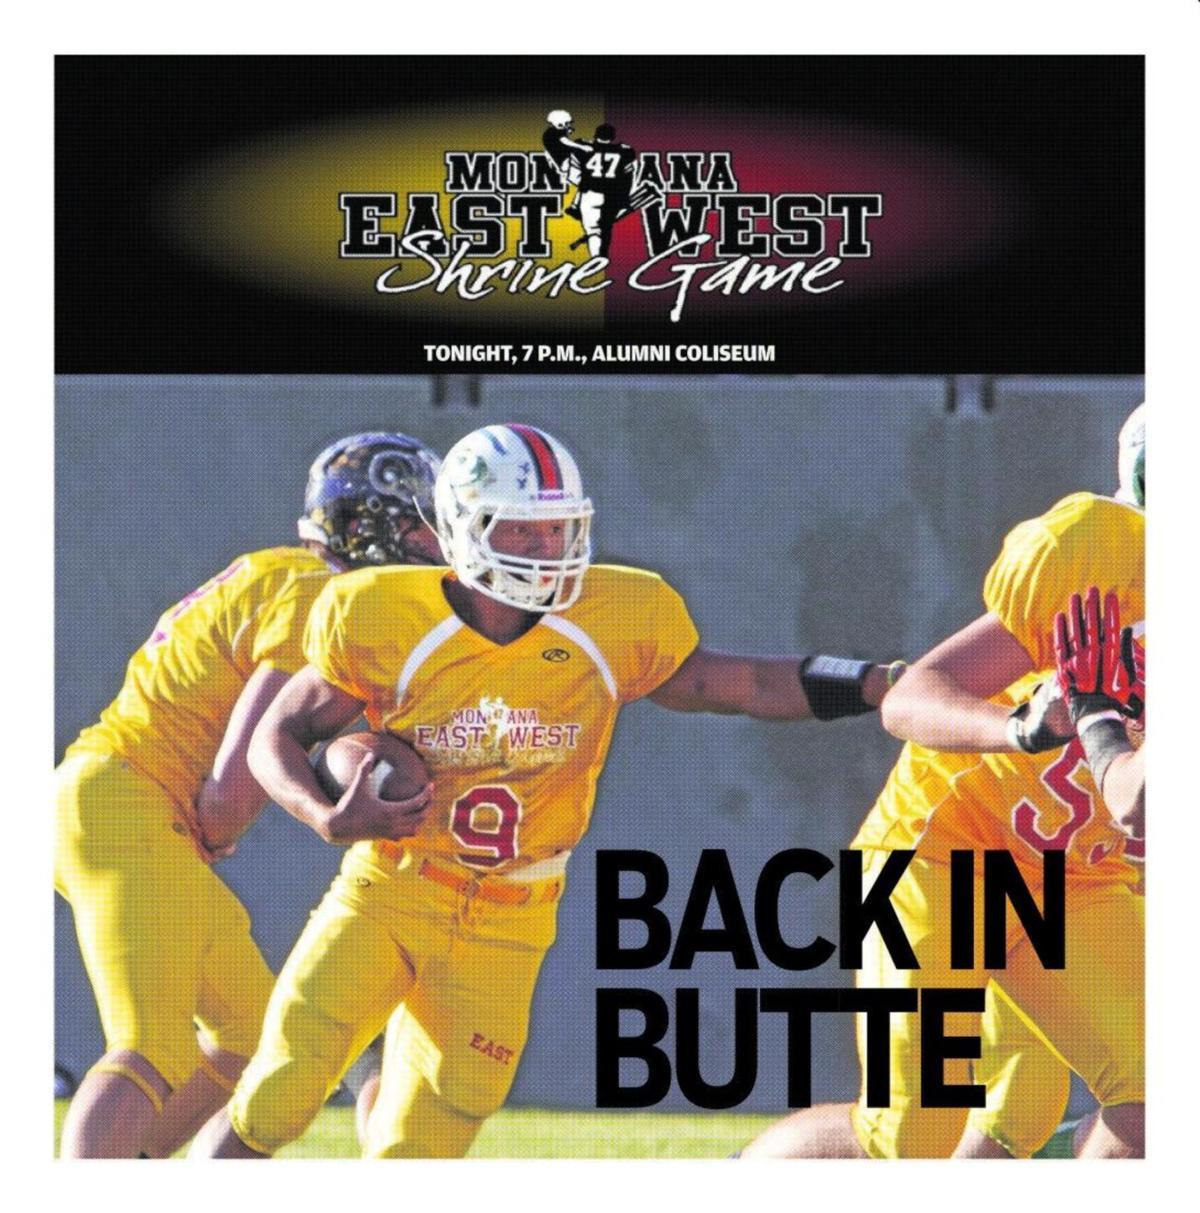 Montana East West Shrine Game 2016